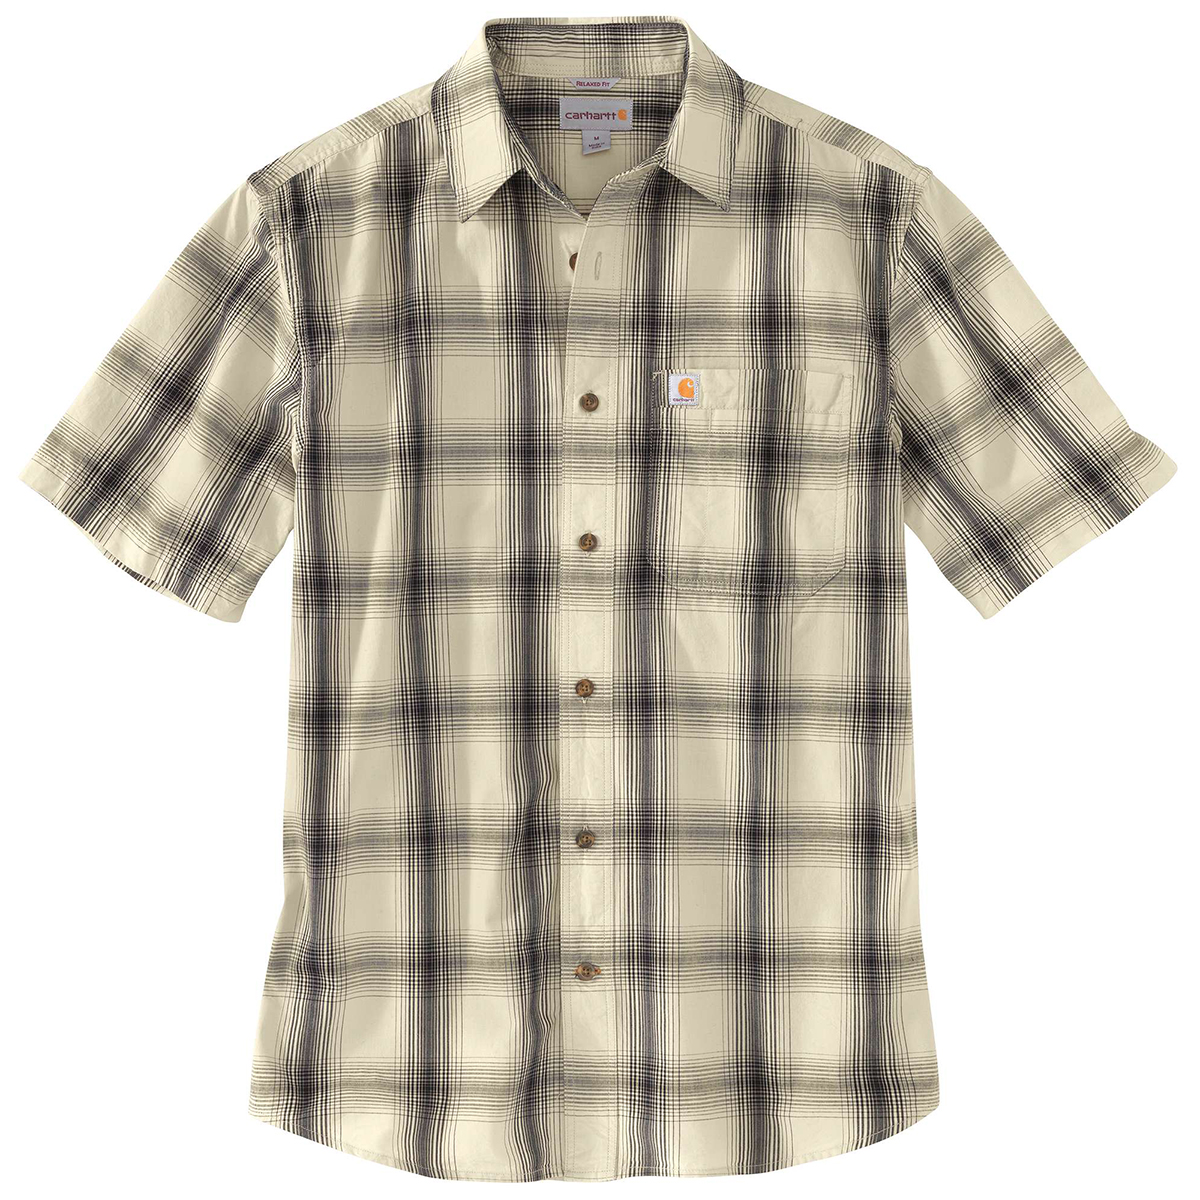 Carhartt Men's Essential Plaid Open Collar Short-Sleeve Shirt - White, S